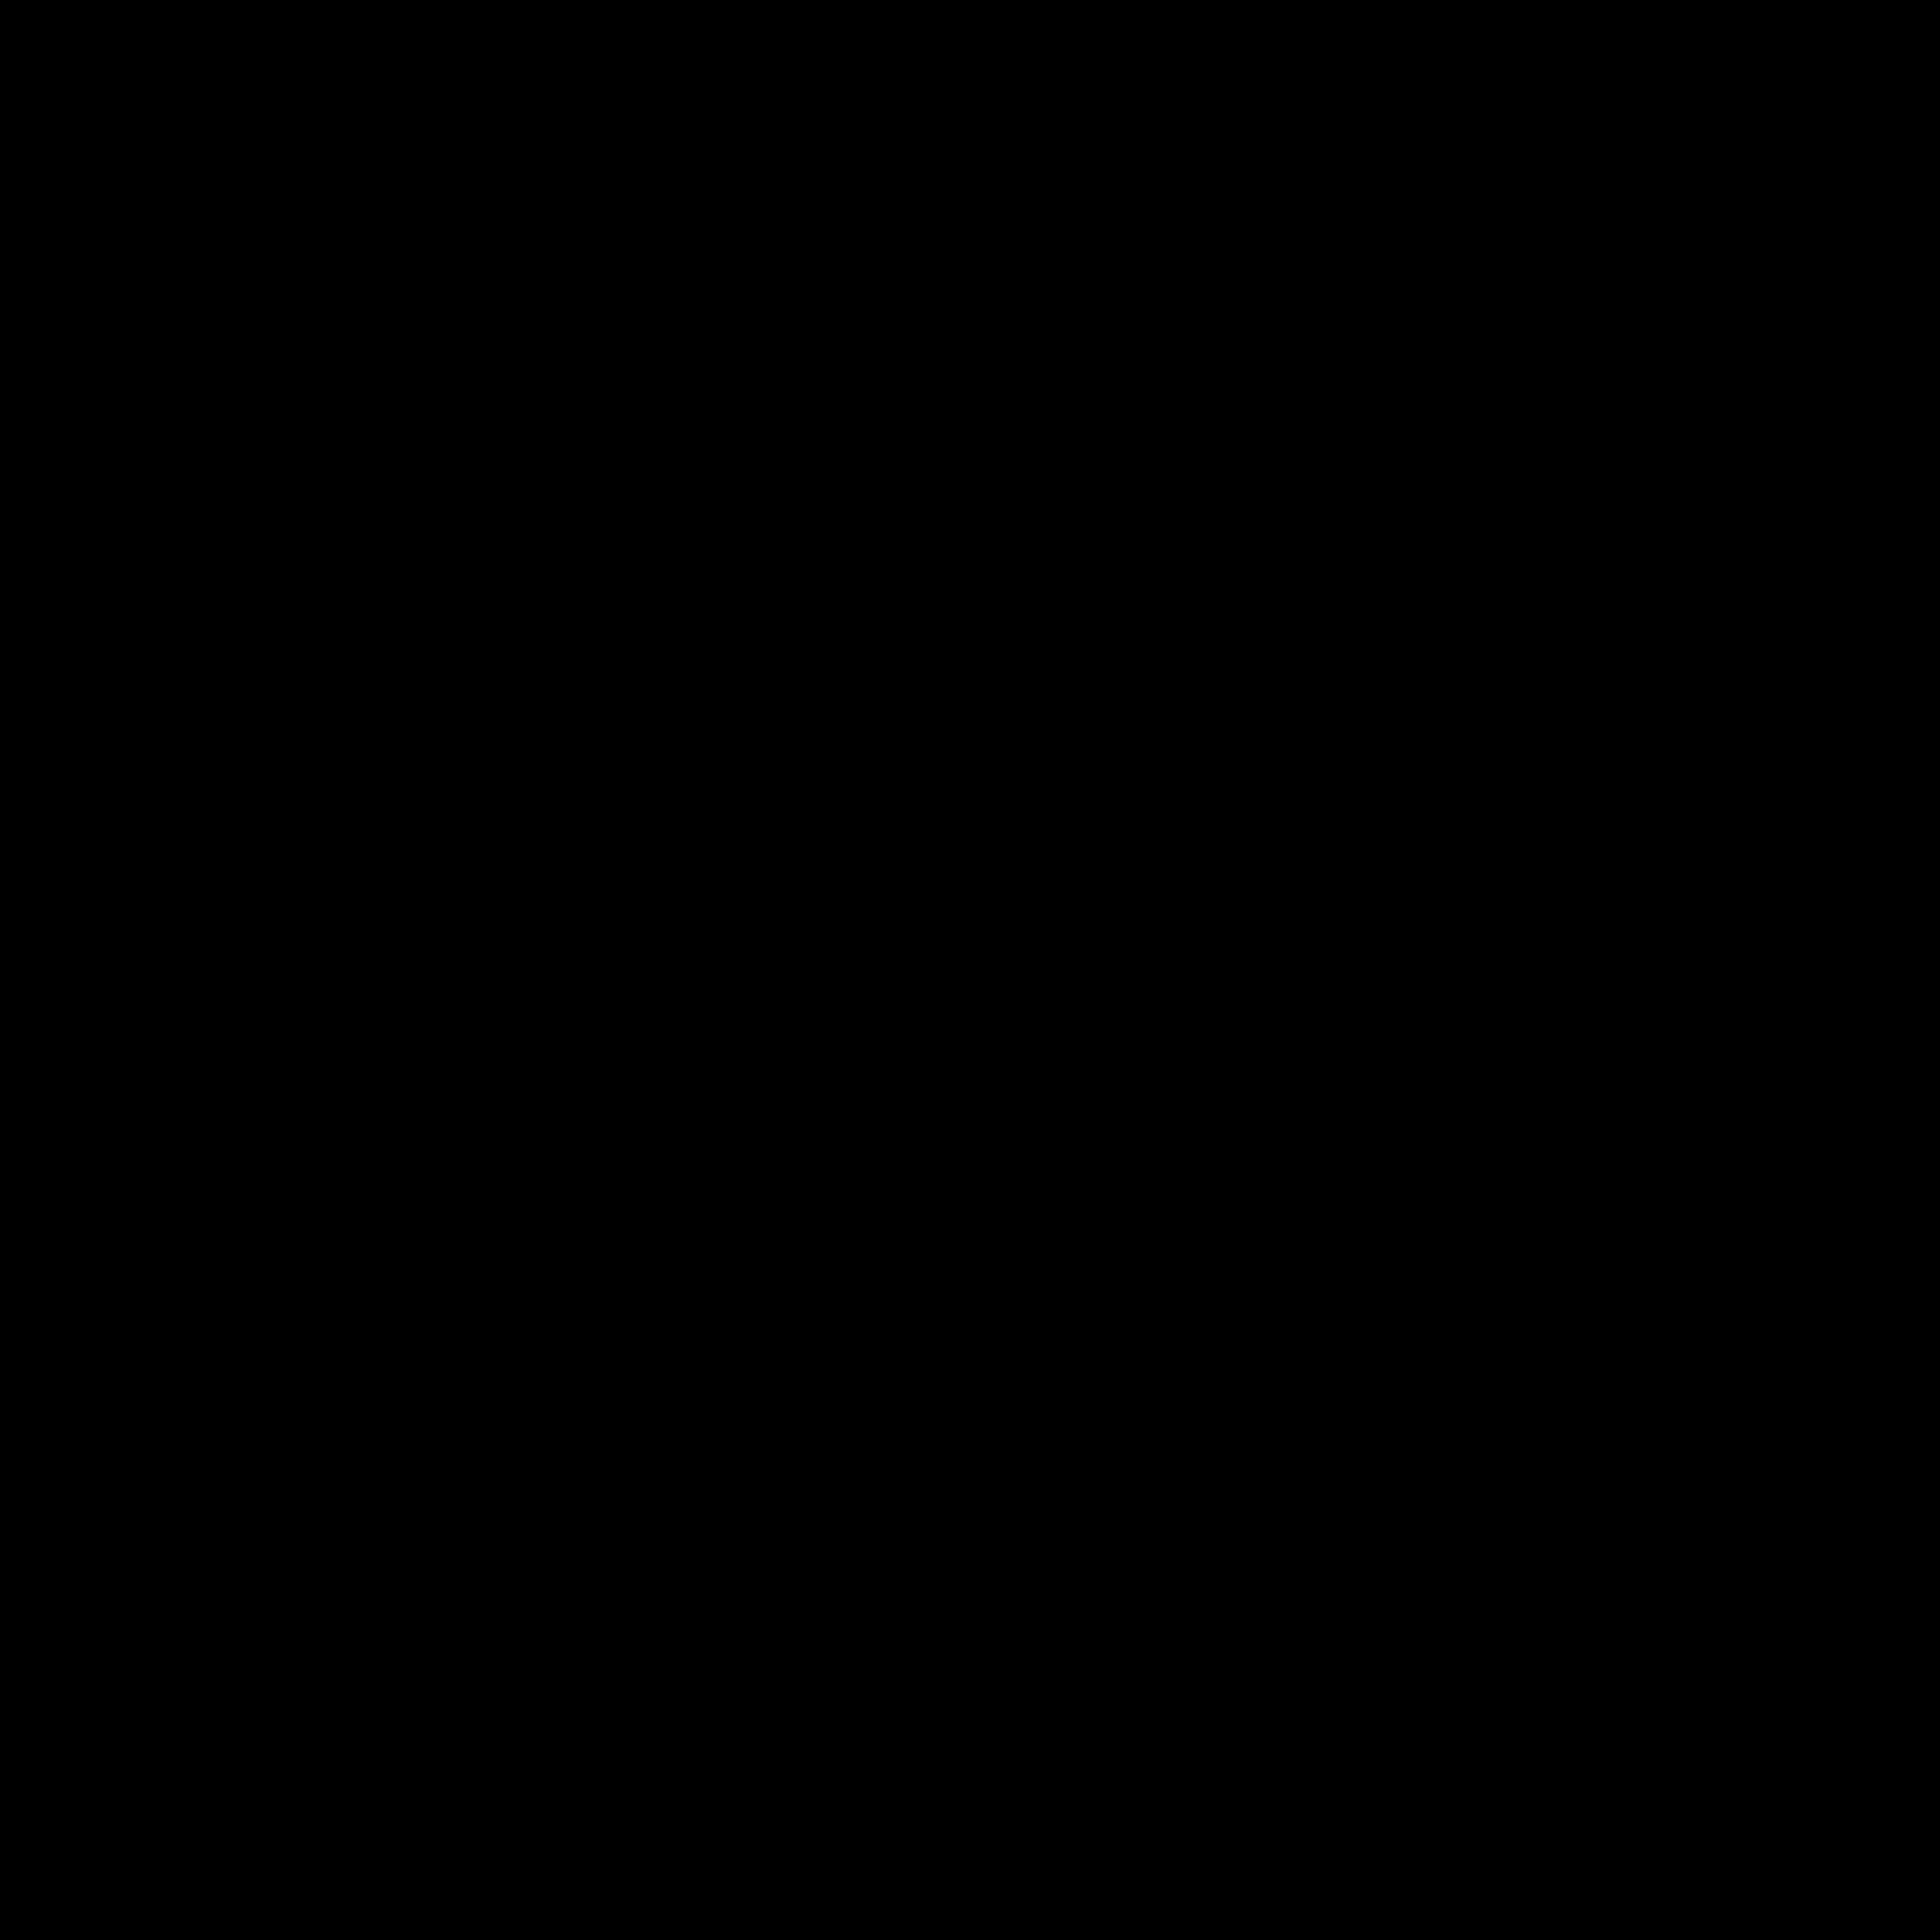 Gaumont Logo PNG Transparent & SVG Vector.